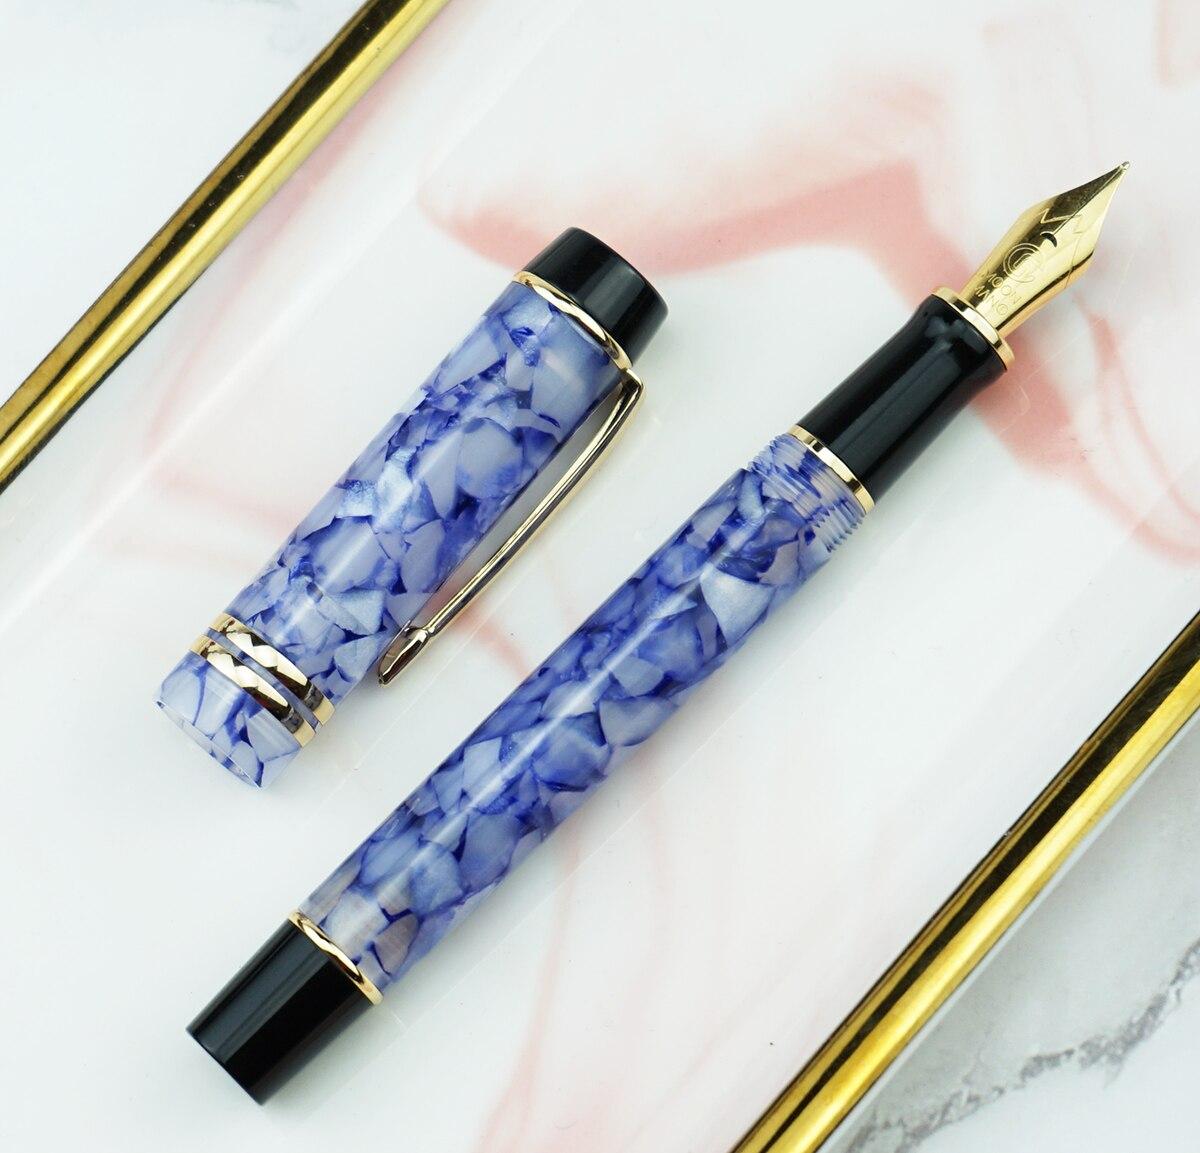 Moonman M600S Celluloid Fountain Pen MOONMAN Iridium Fine Nib 0.5mm Crystal Blue Fashion Office Writing Gift Pen for Business